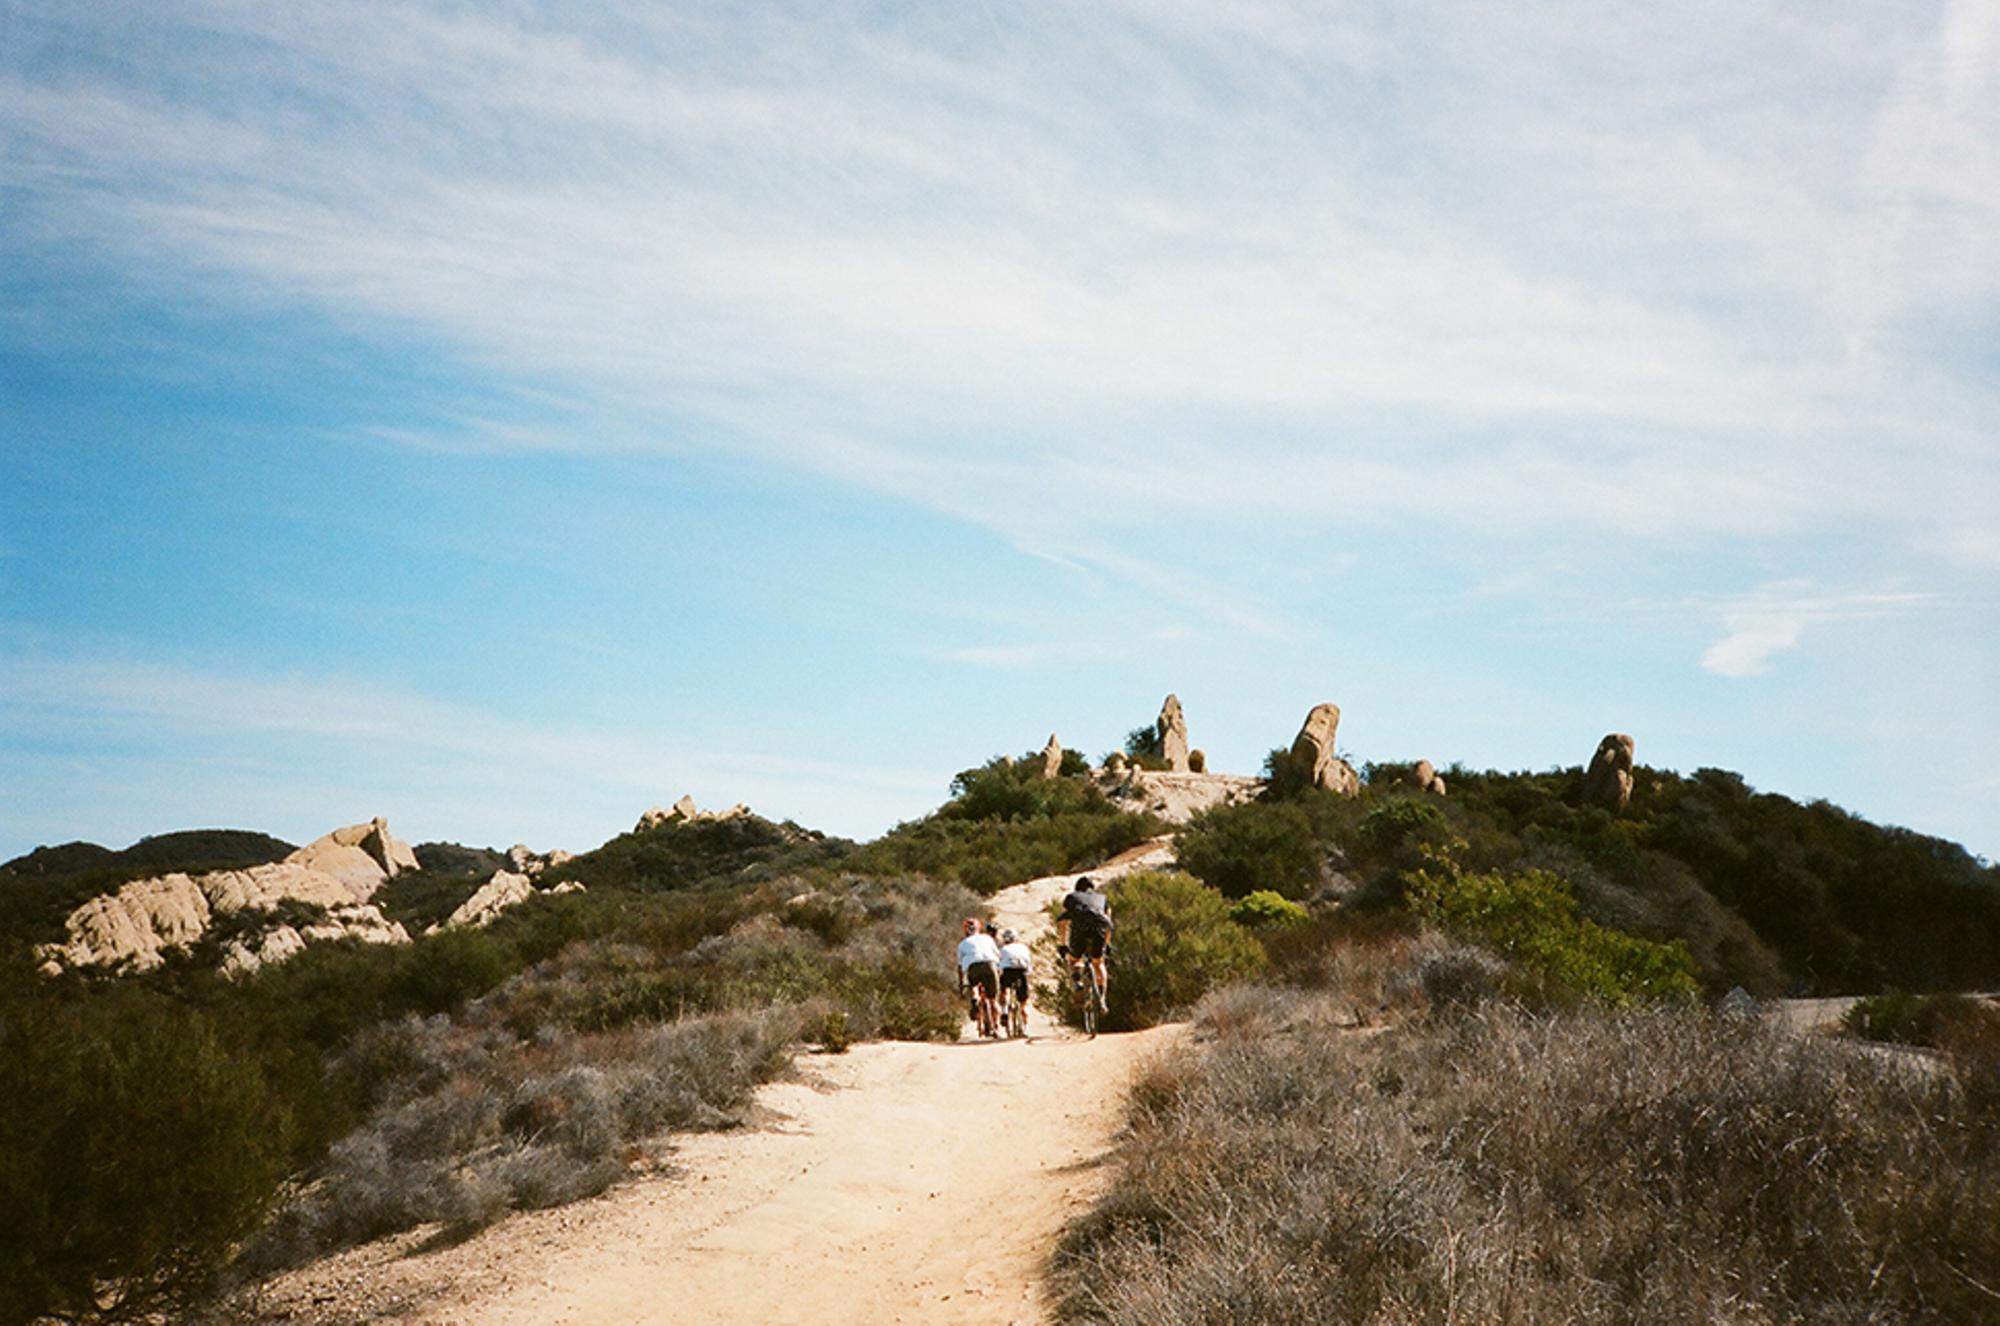 This climb was so amazing.